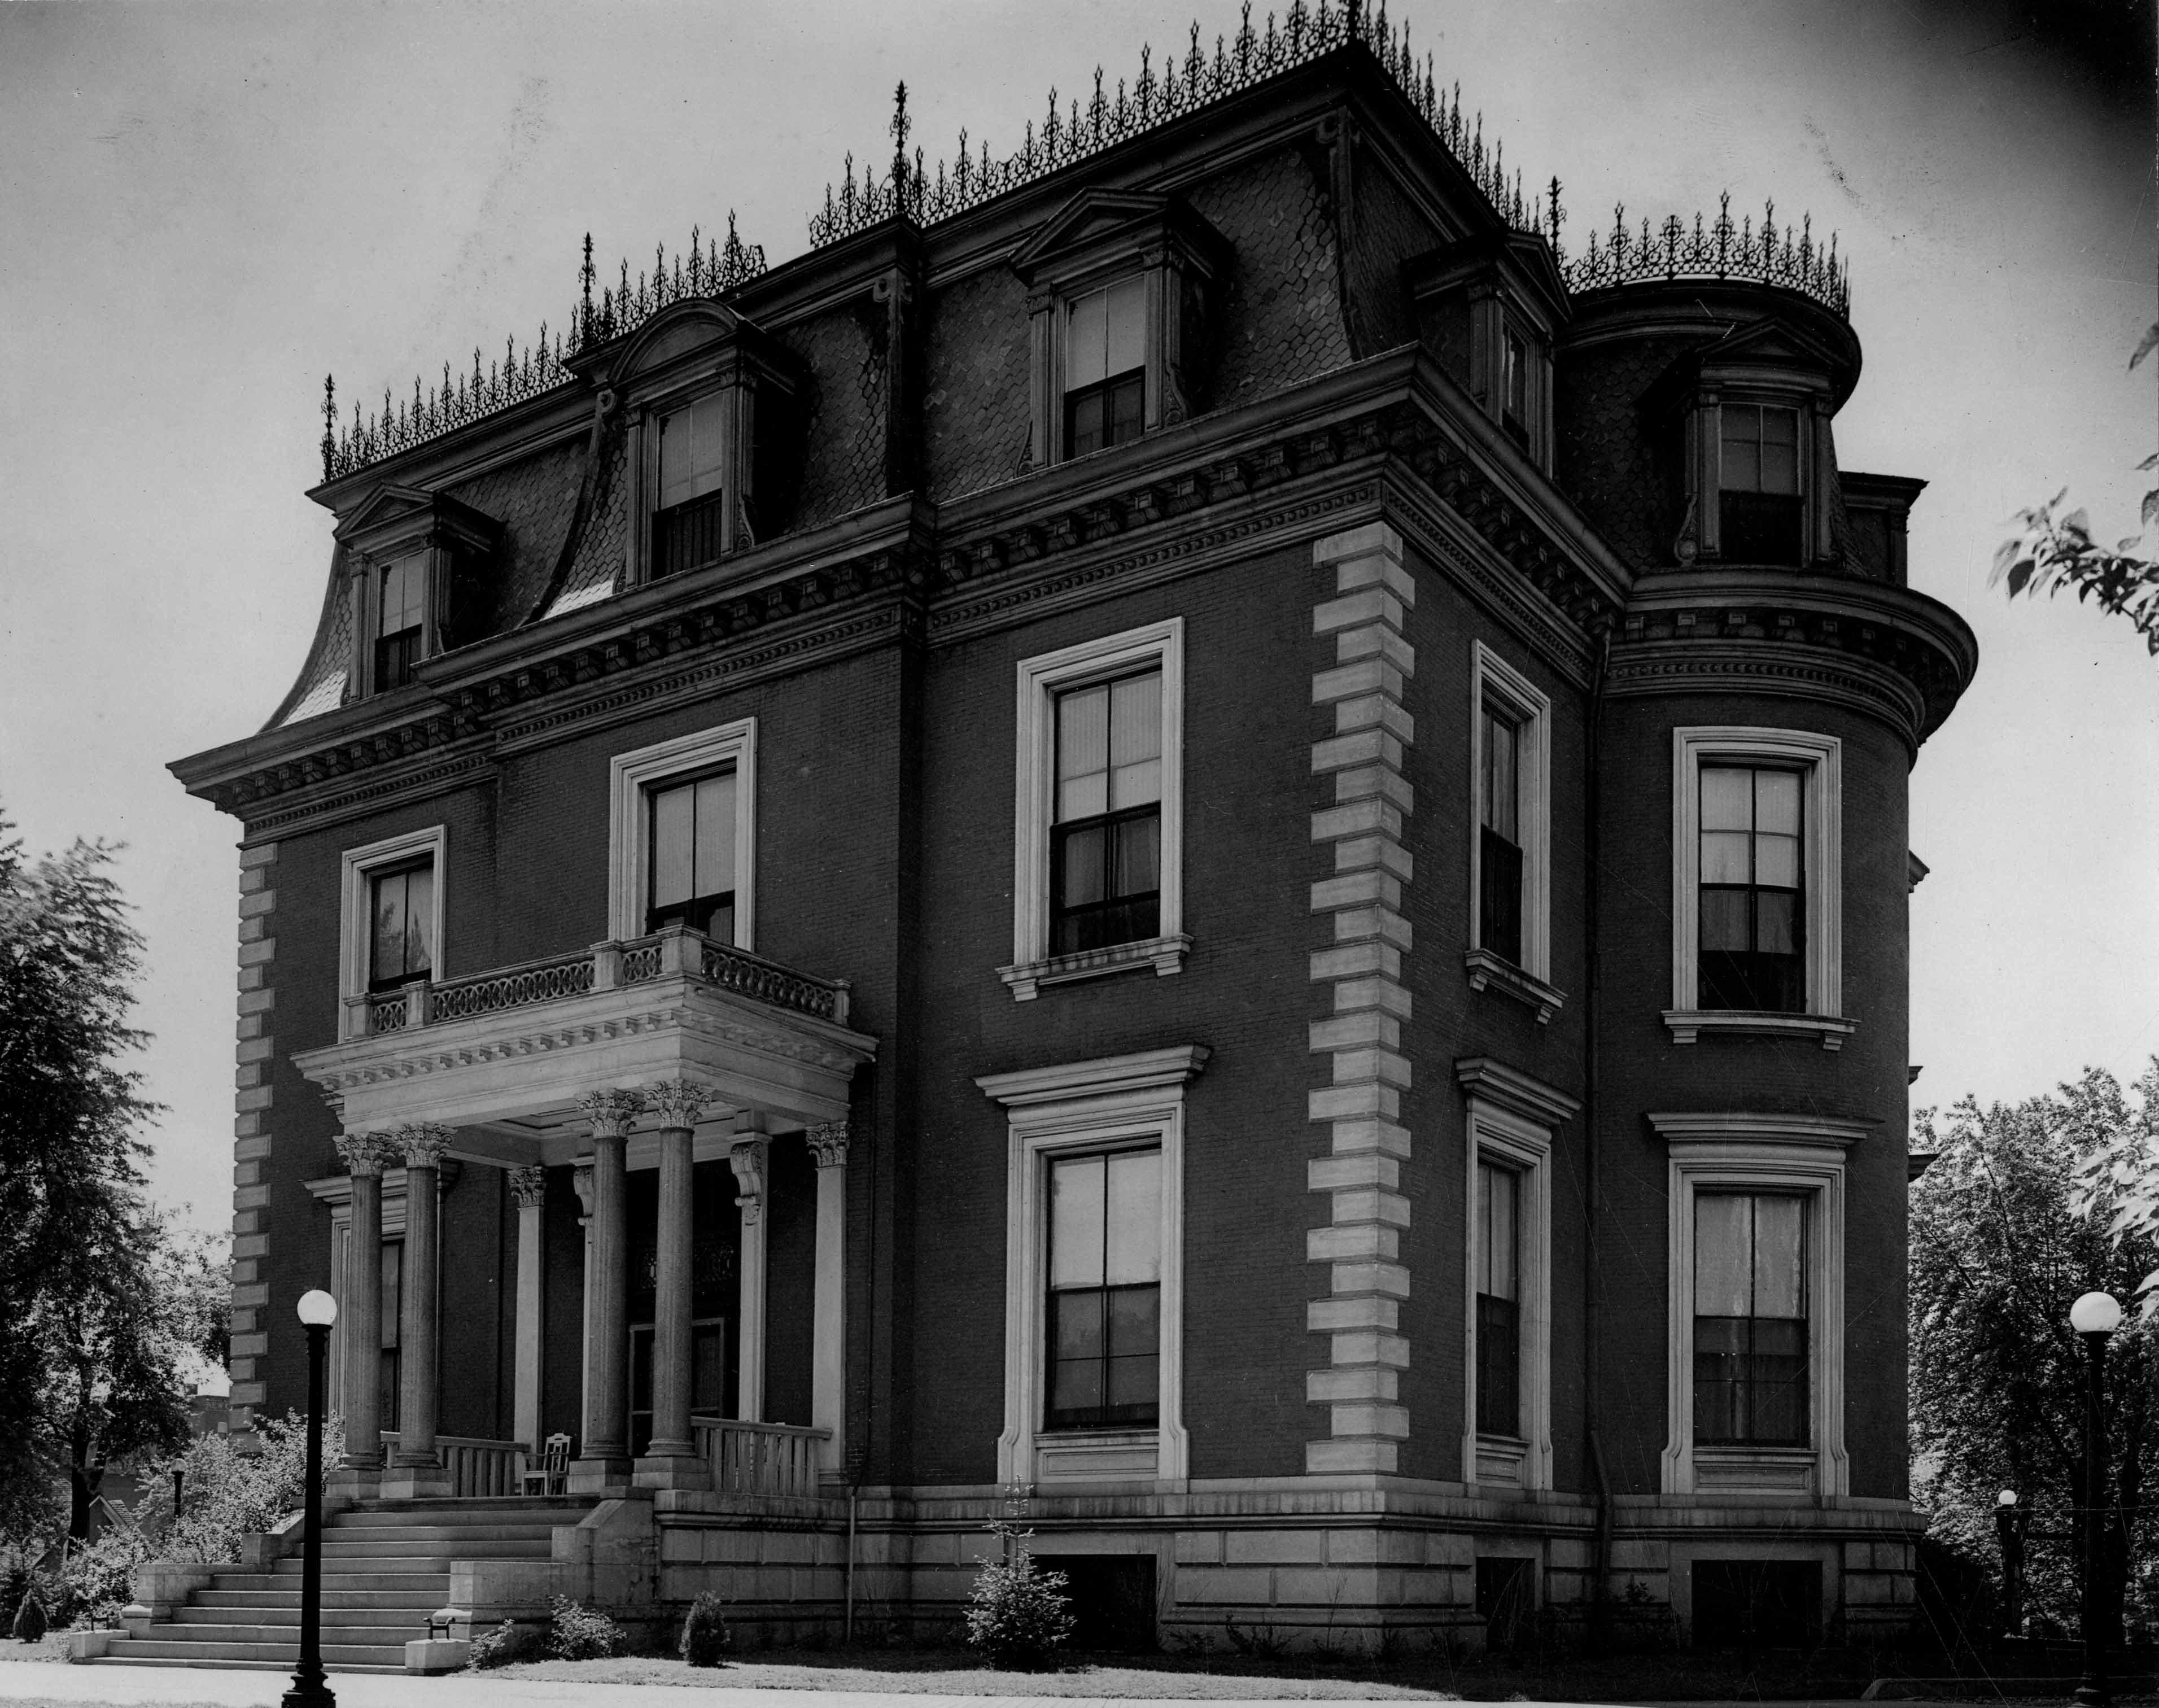 Missouri Governor's Mansion, undated photo. Courtesy of the Missouri State Museum.